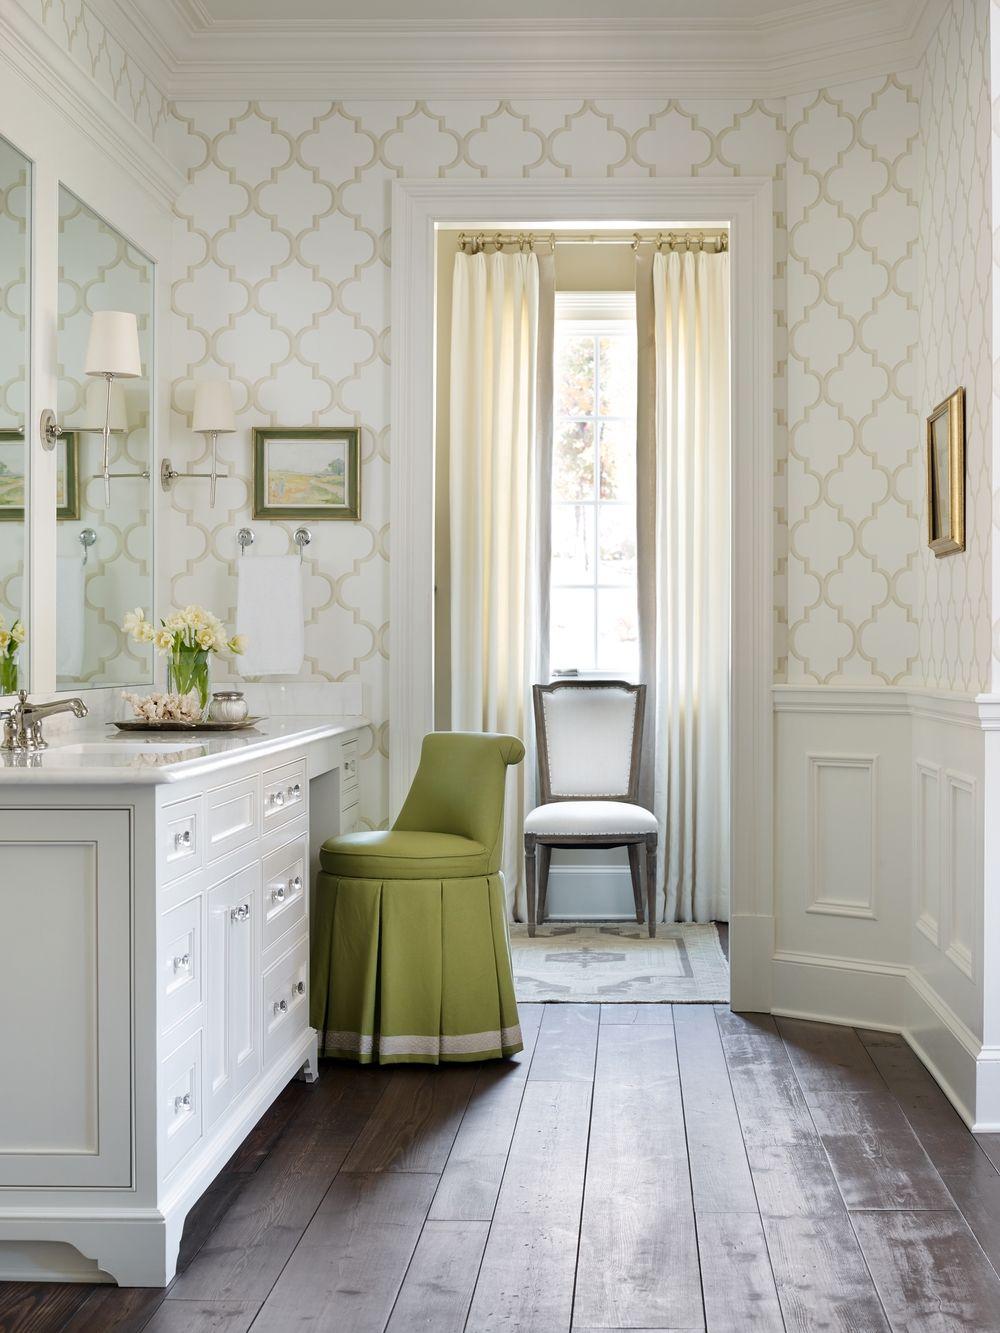 Fresh Wallpapered Bathrooms Ideas